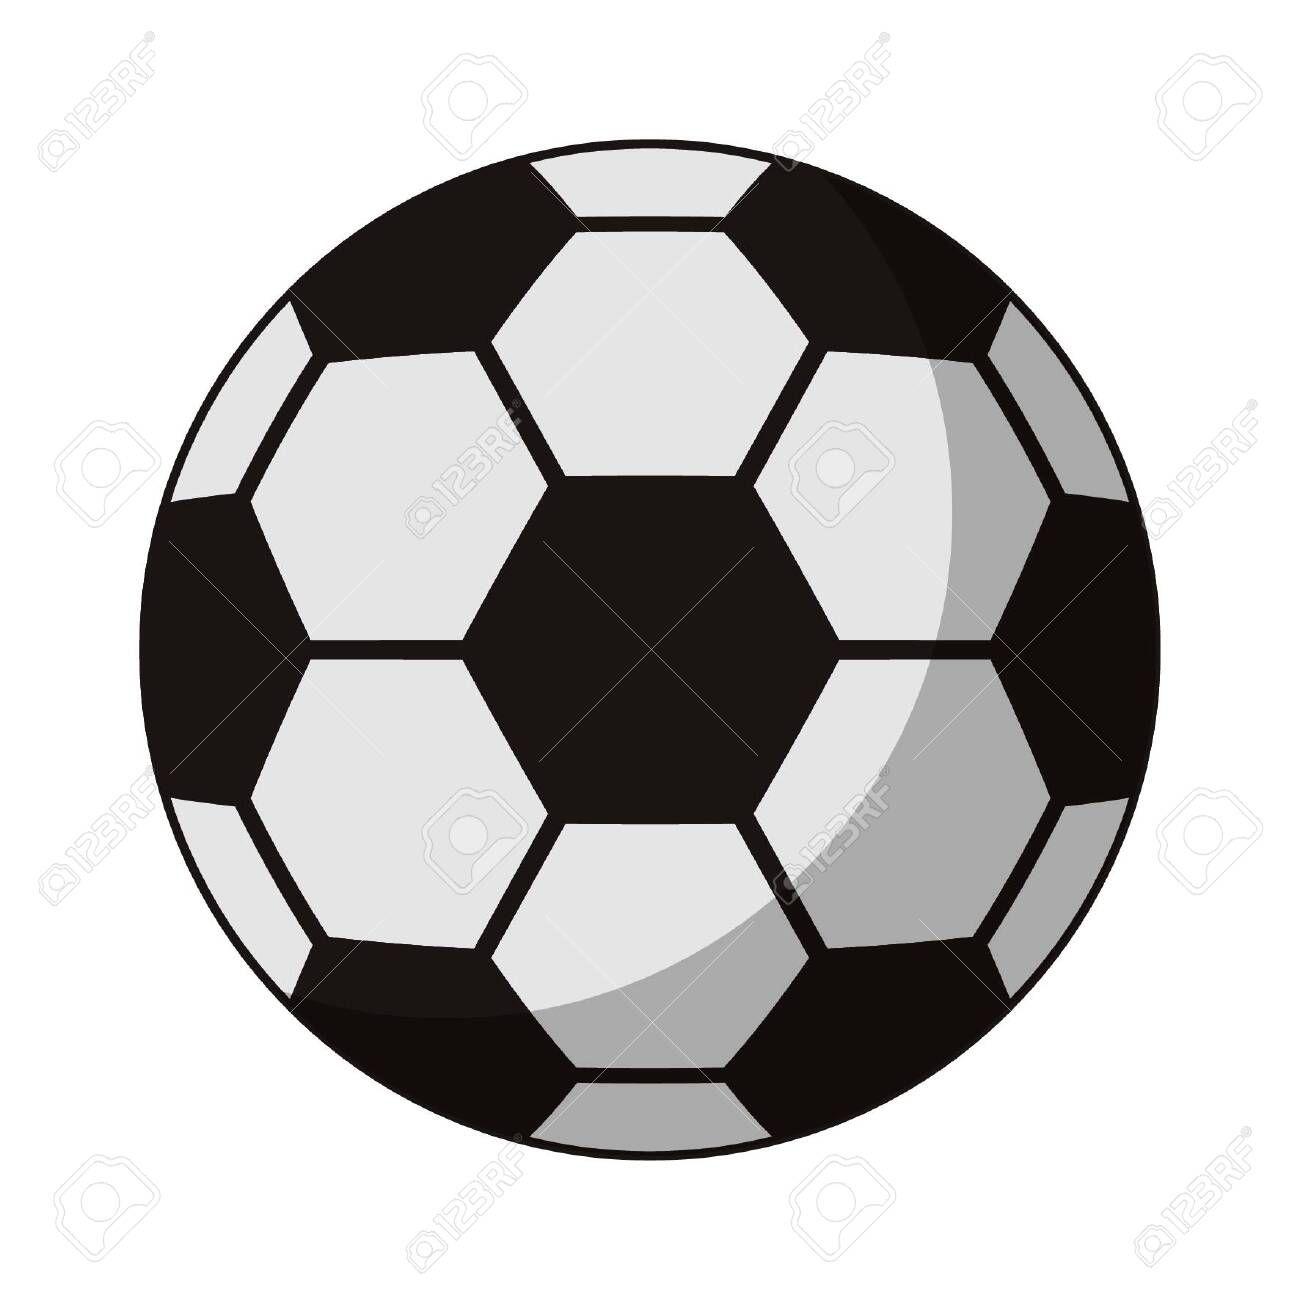 Soccer Ball Sport Cartoon Vector Illustration Graphic Design Moon Cloud And Raining Drop Ve Graphic Design Illustration Illustration Design Vector Illustration